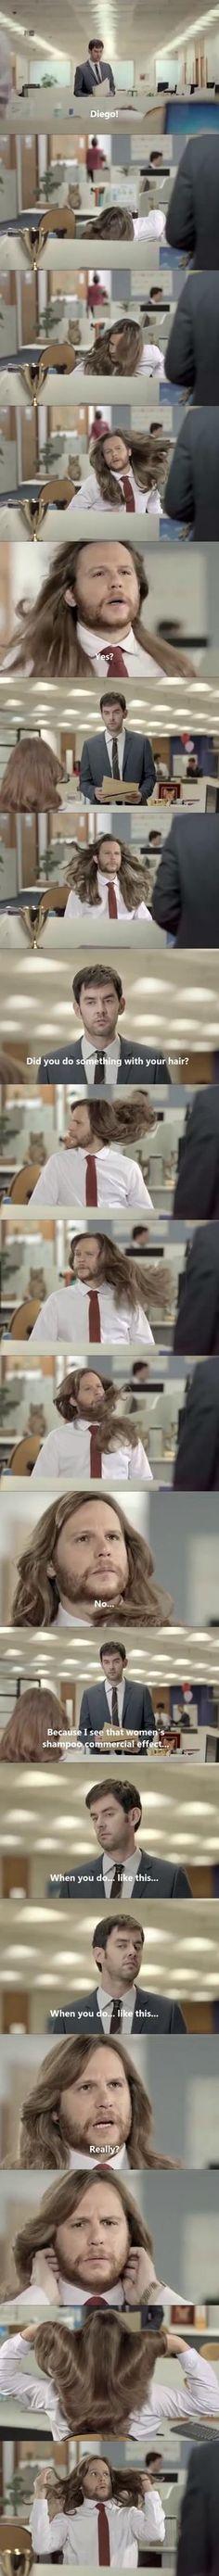 What happens when MEN use woMEN shampoo - Imgur